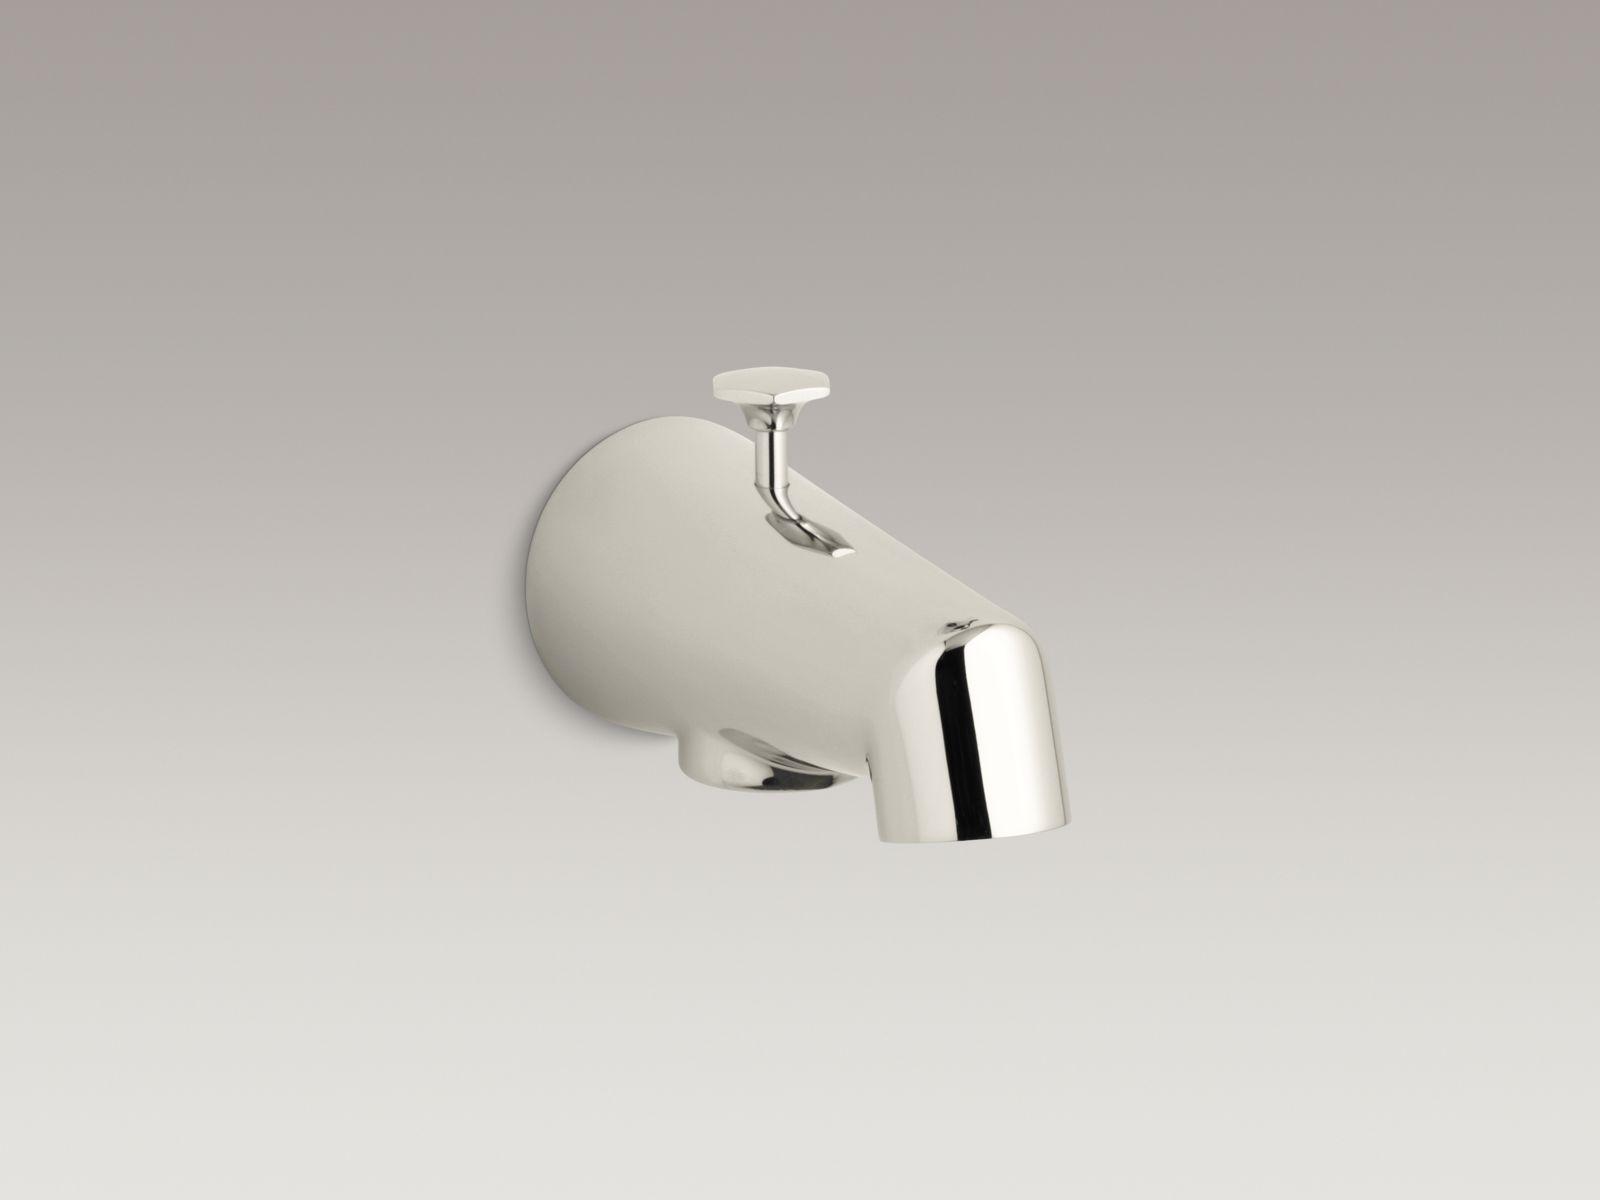 "Kohler K-6855-SN Standard Wall-mounted 5"" Diverter Bathtub Spout with Disc-shaped Knob Vibrant Polished Nickel"